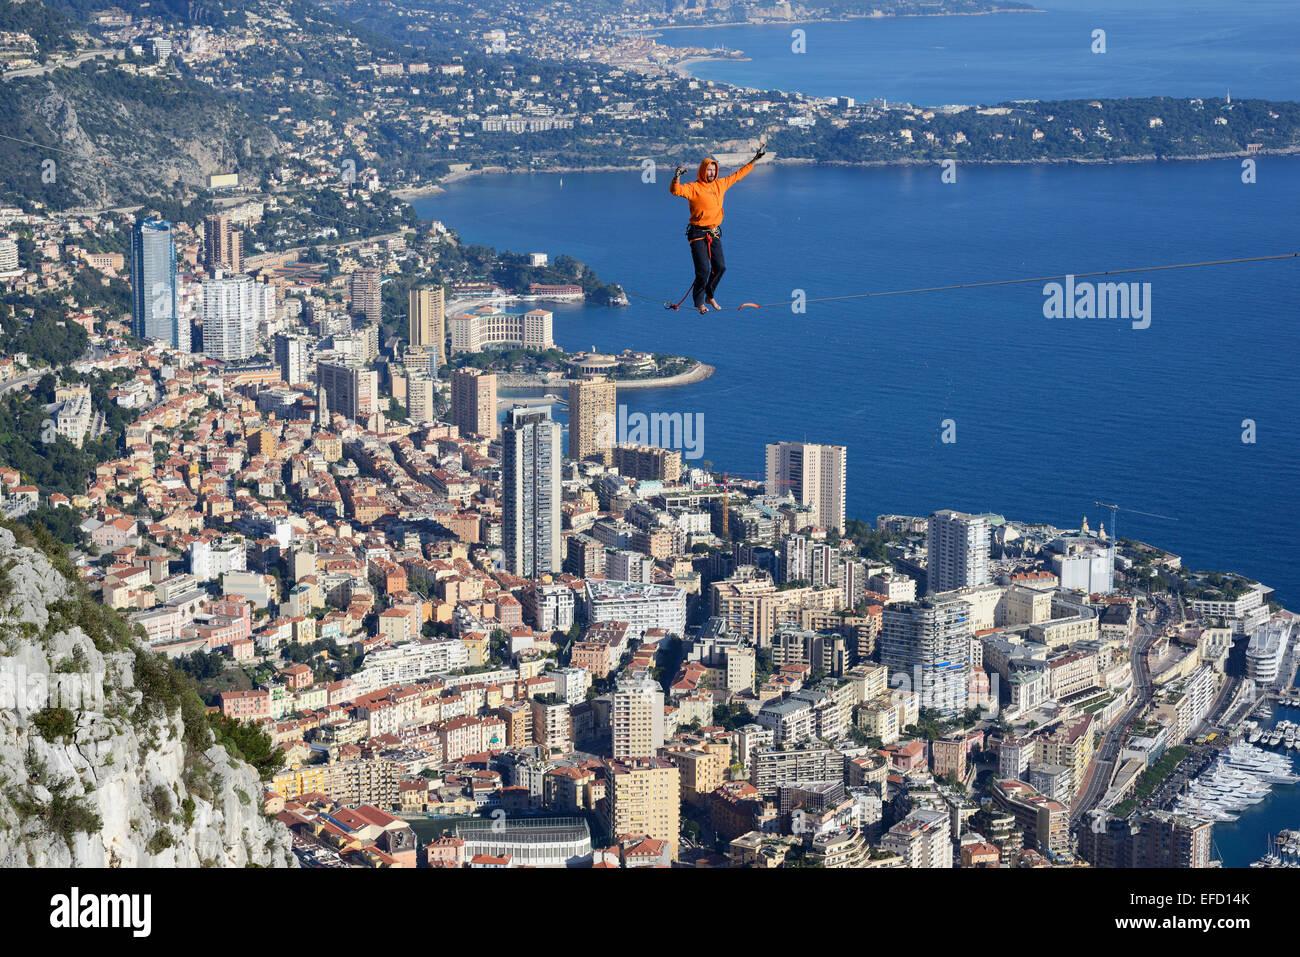 YOUNG MAN HIGHLINING (SLACKLINING) at an elevation of 550m amsl. Principality of Monaco below him. - Stock Image